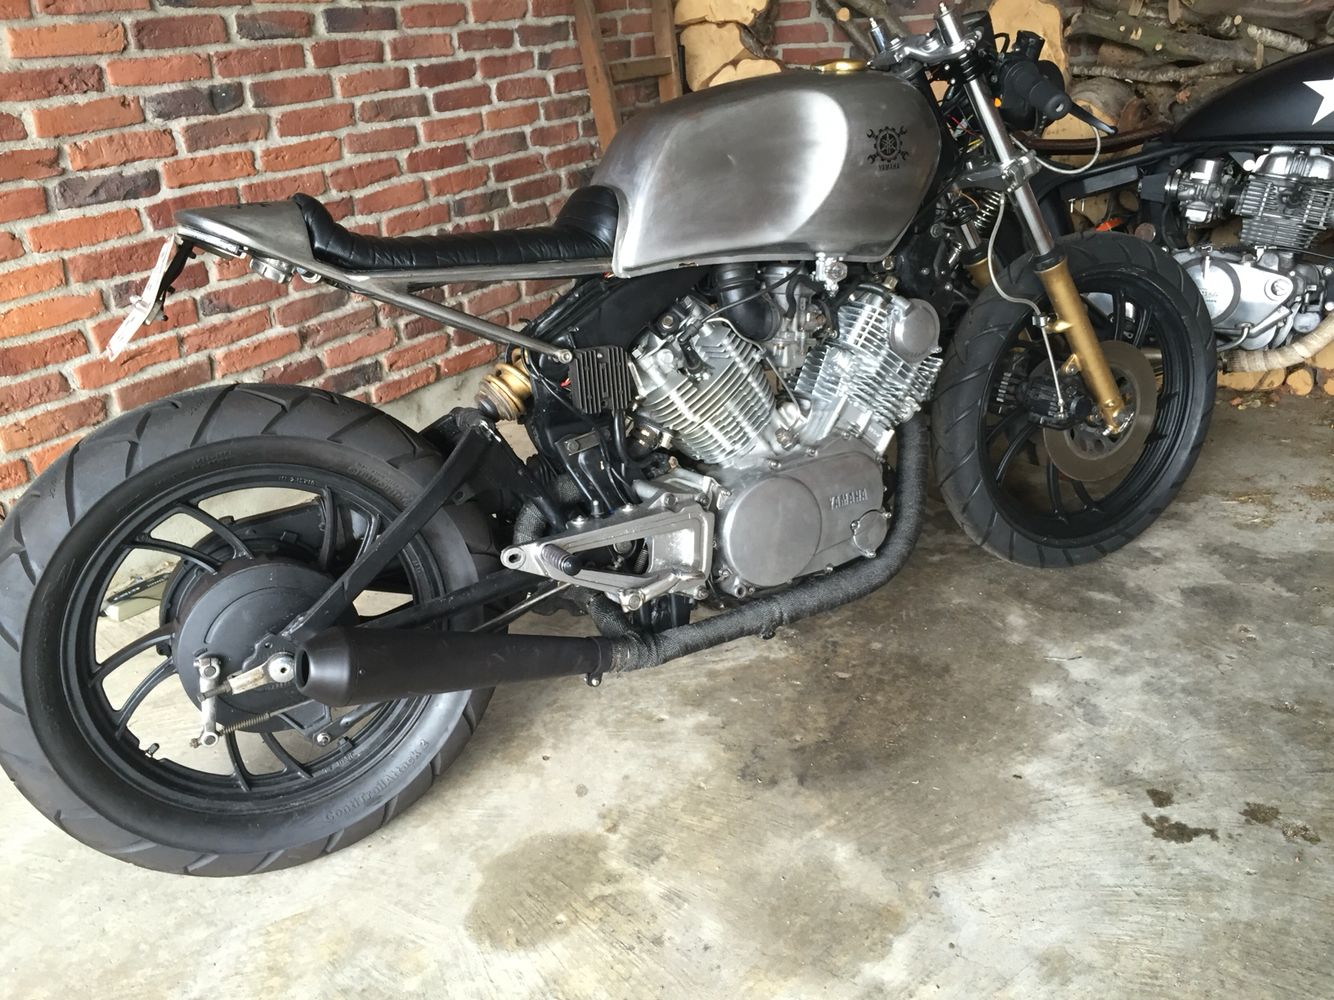 #Yamaha #tr1 #xv 1000 #cafe racer